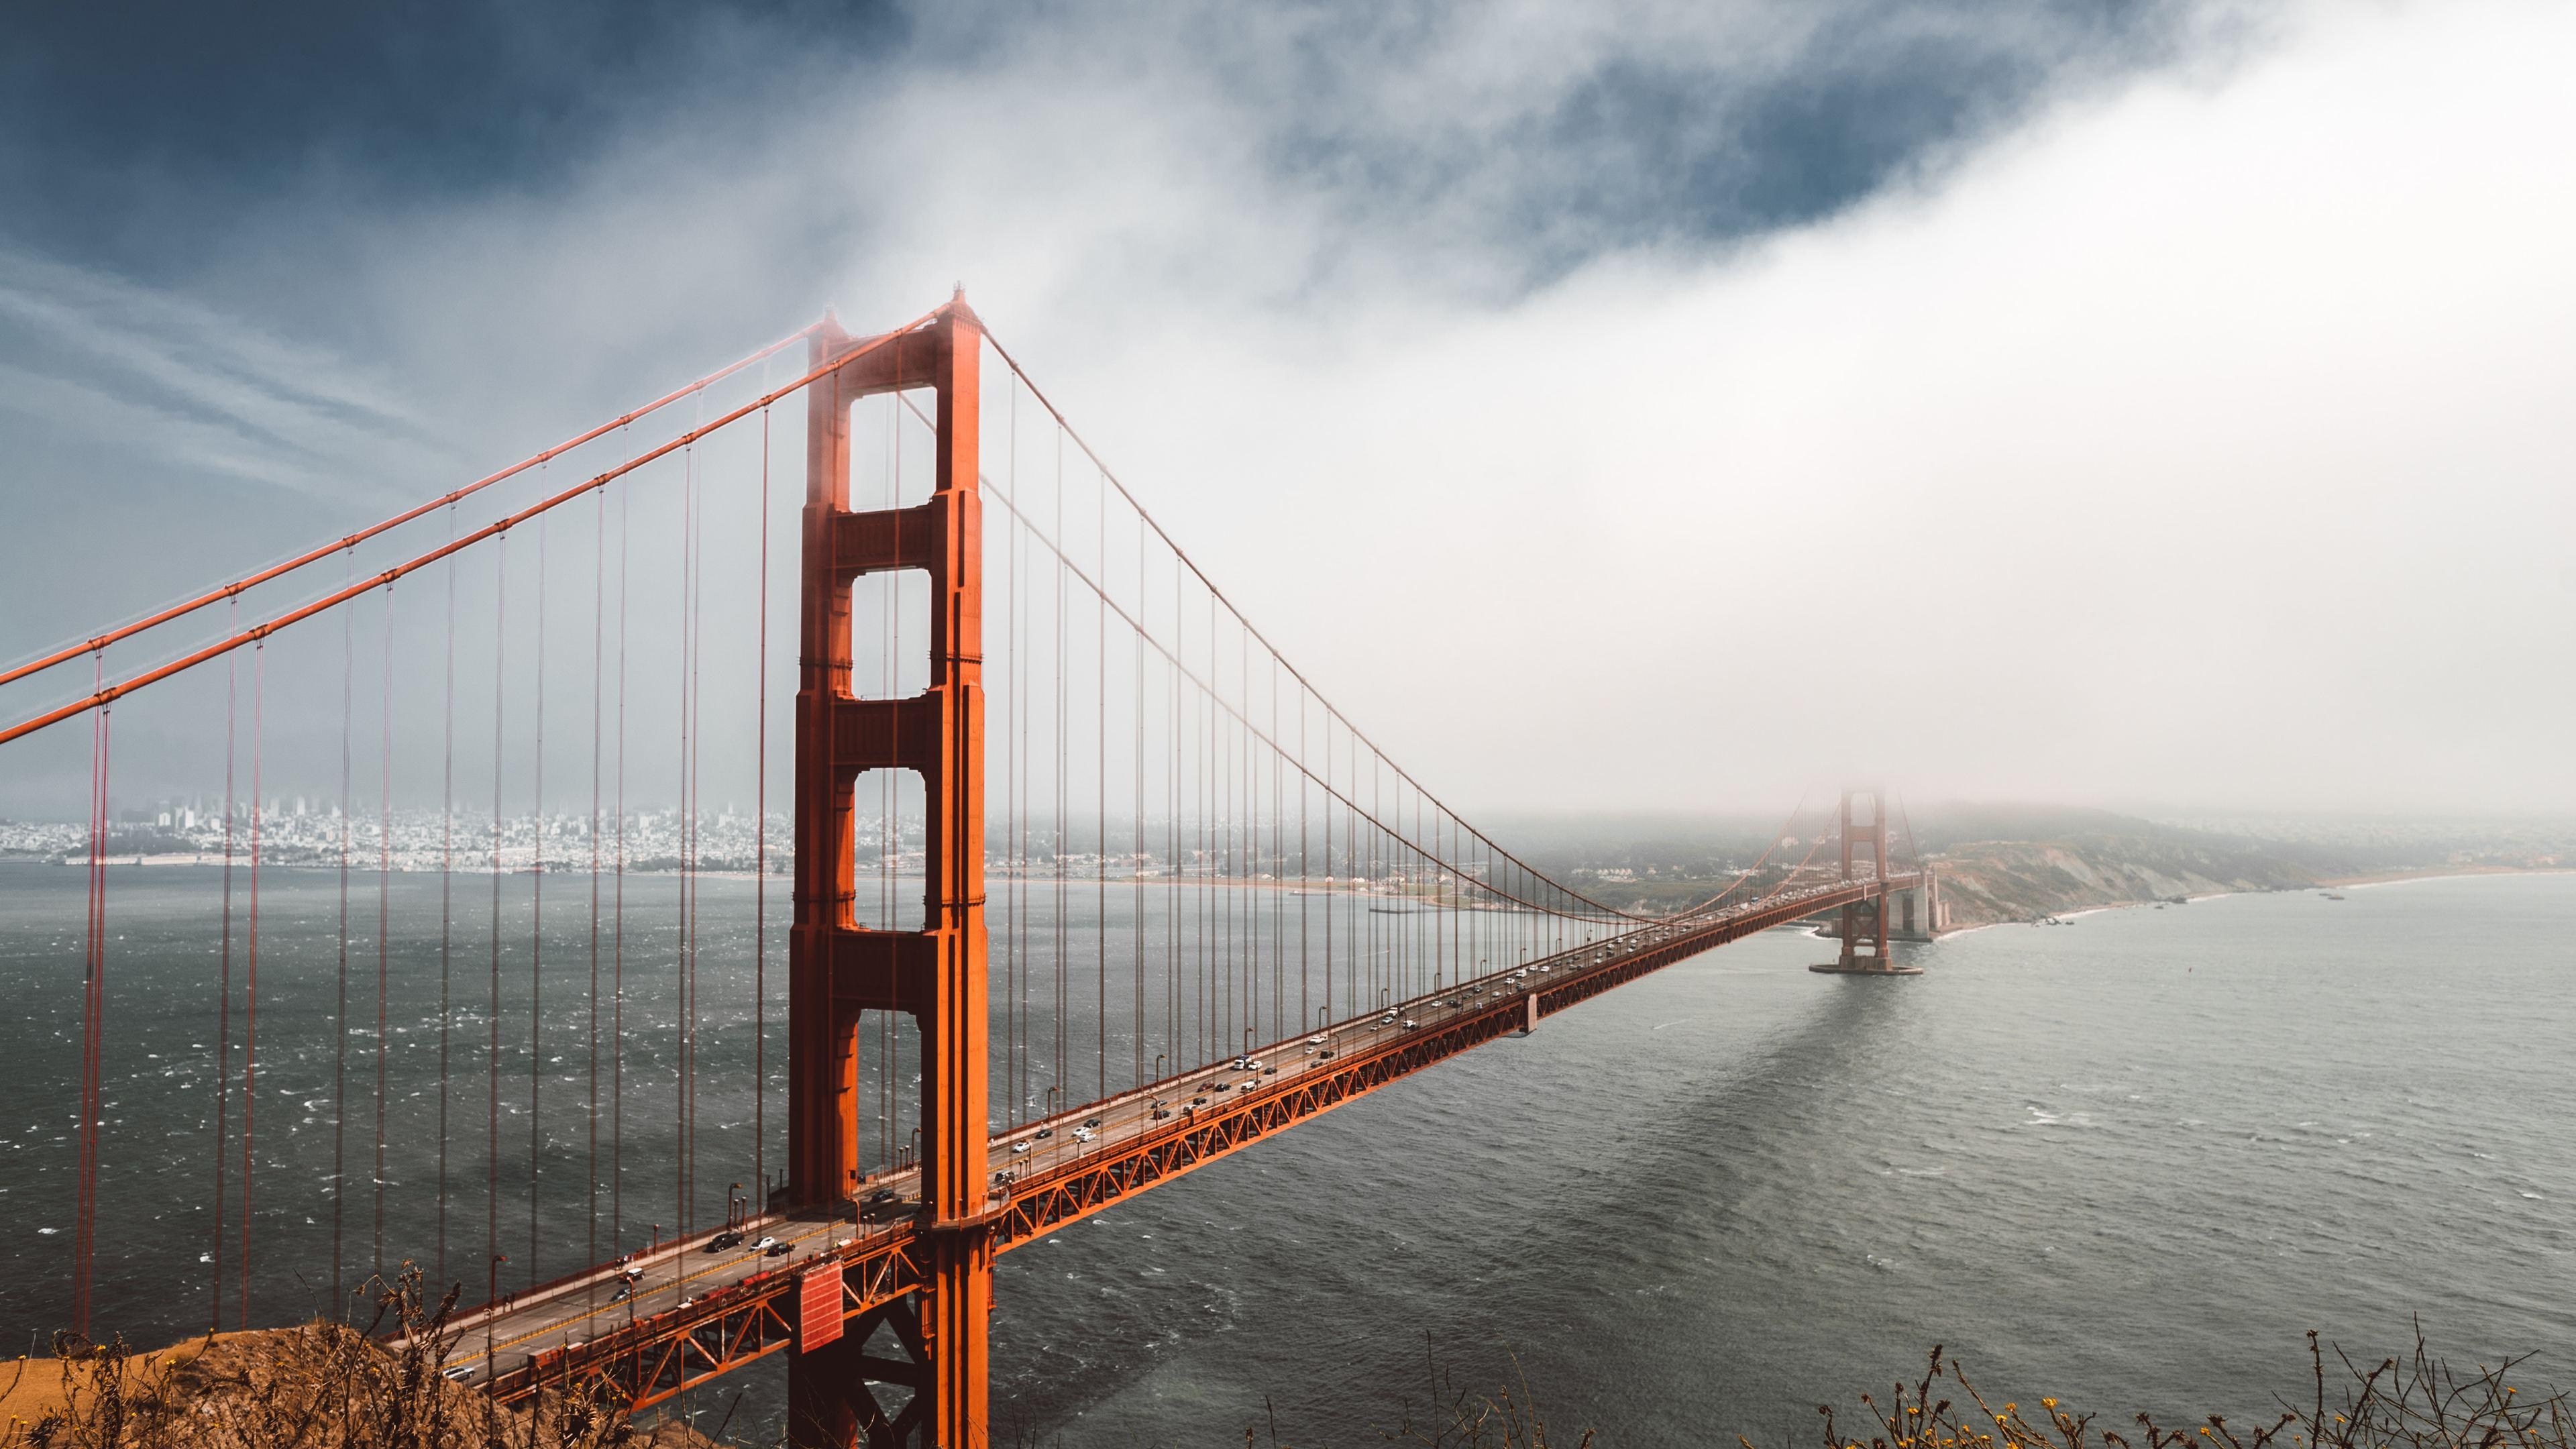 4k golden gate bridge 1538072115 - 4k Golden Gate Bridge - world wallpapers, san francisco wallpapers, hd-wallpapers, golden gate bridge wallpapers, bridge wallpapers, 4k-wallpapers